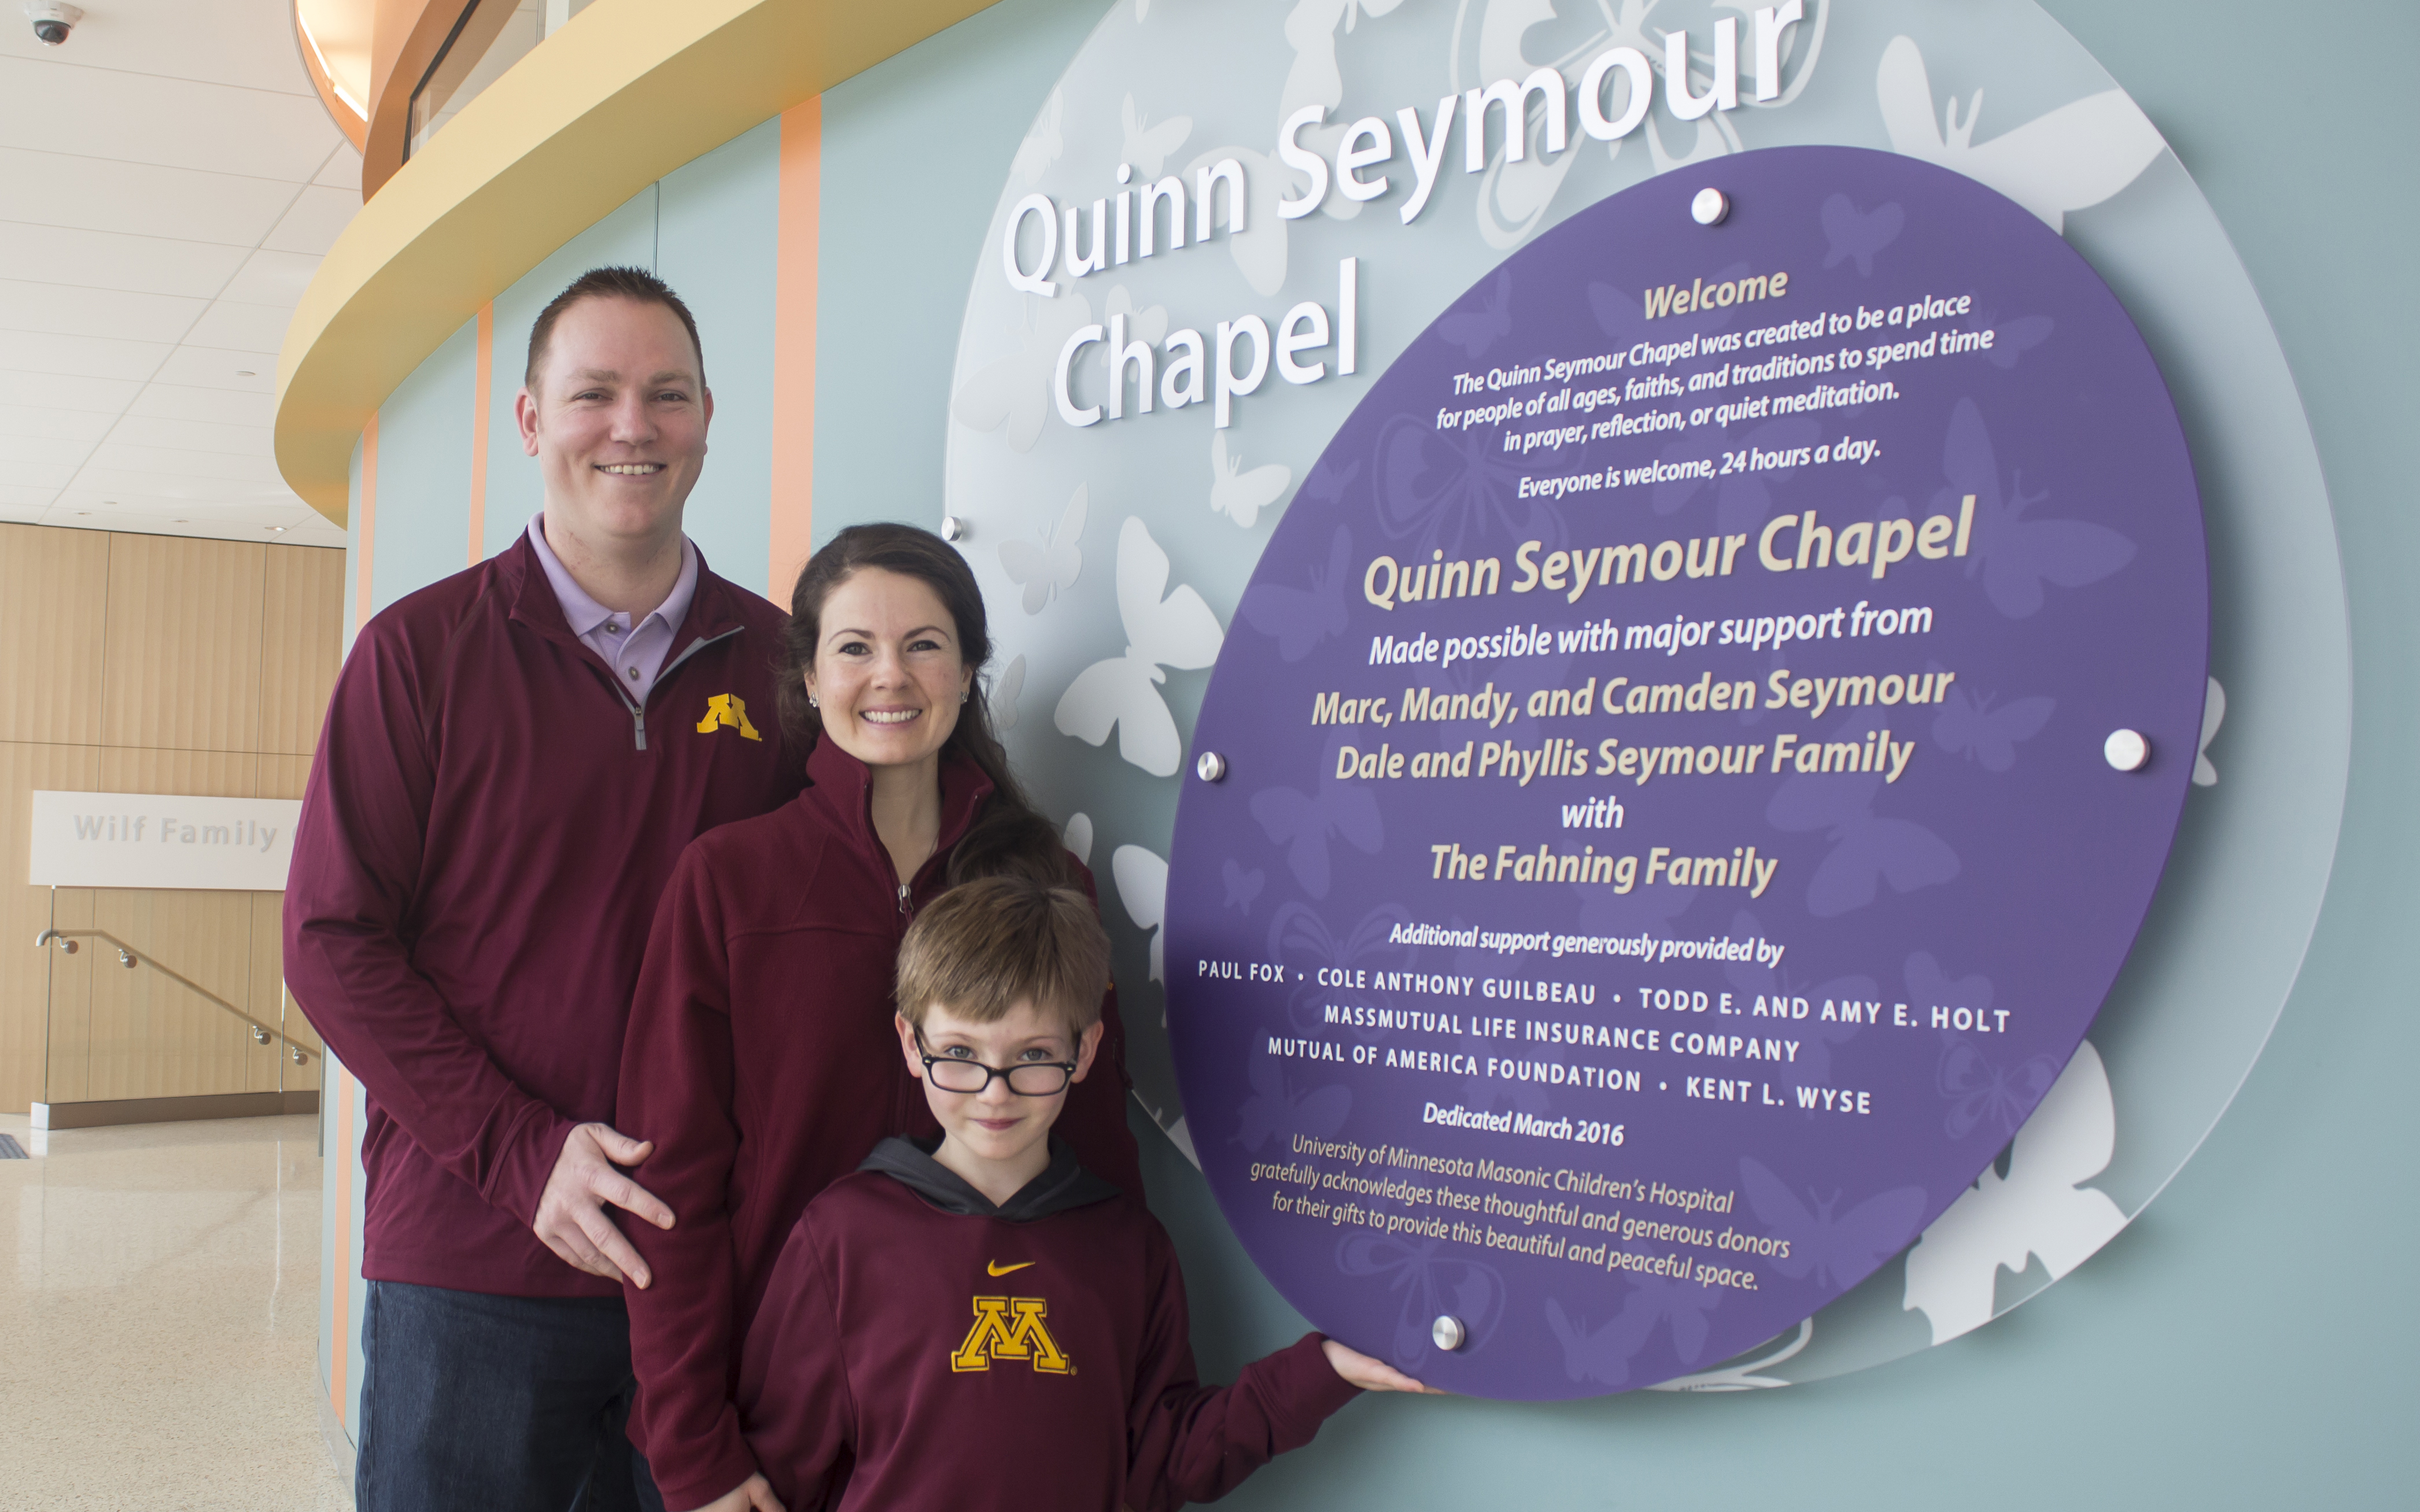 Quinn Seymour Chapel Opens At University Of Minnesota Masonic Childrens Hospital